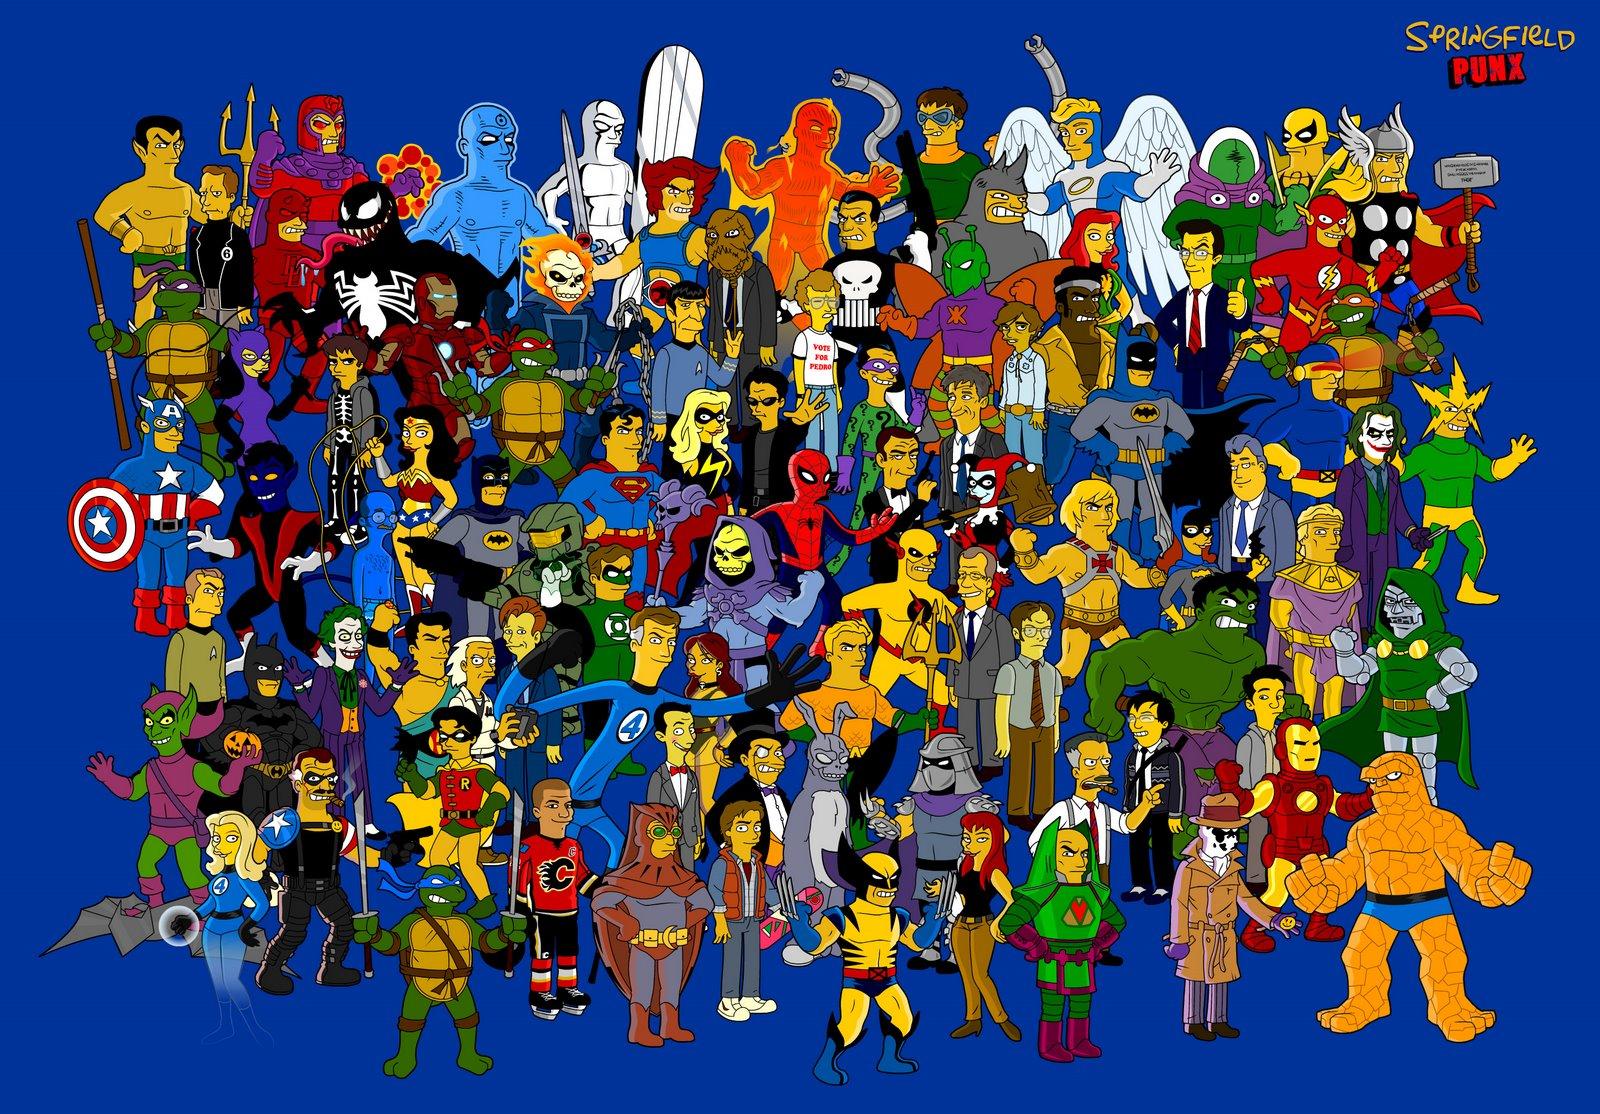 http://2.bp.blogspot.com/-GVRogq8UQUk/TWfibb_rHCI/AAAAAAAAPtc/qBSSHHJNy9o/s1600/heroes-y-villanos-simpsonizados.jpg